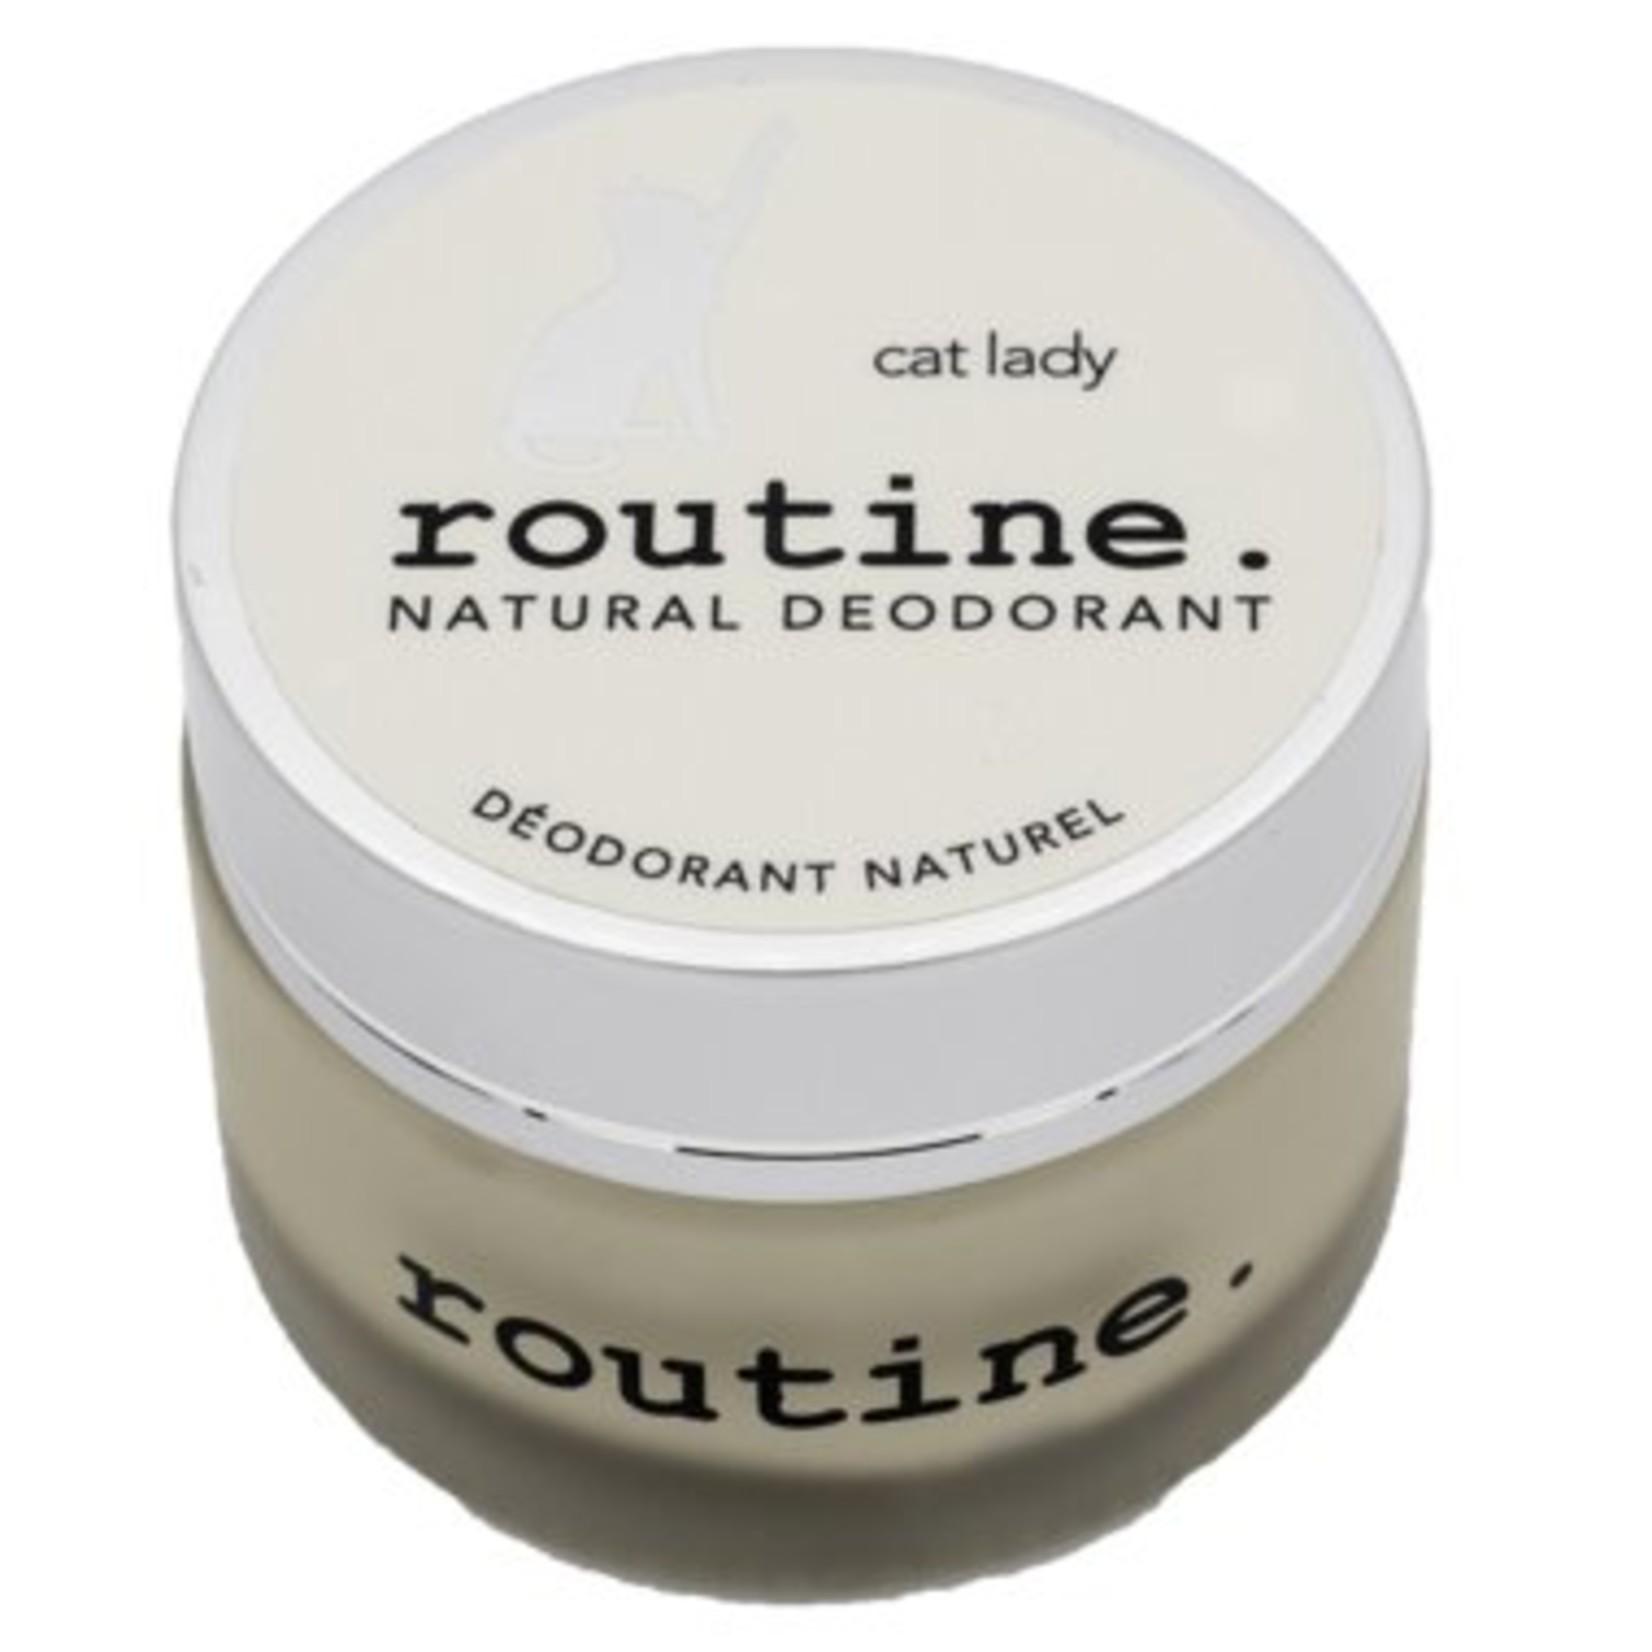 Routine Cat Lady Natural Deodorant 58g